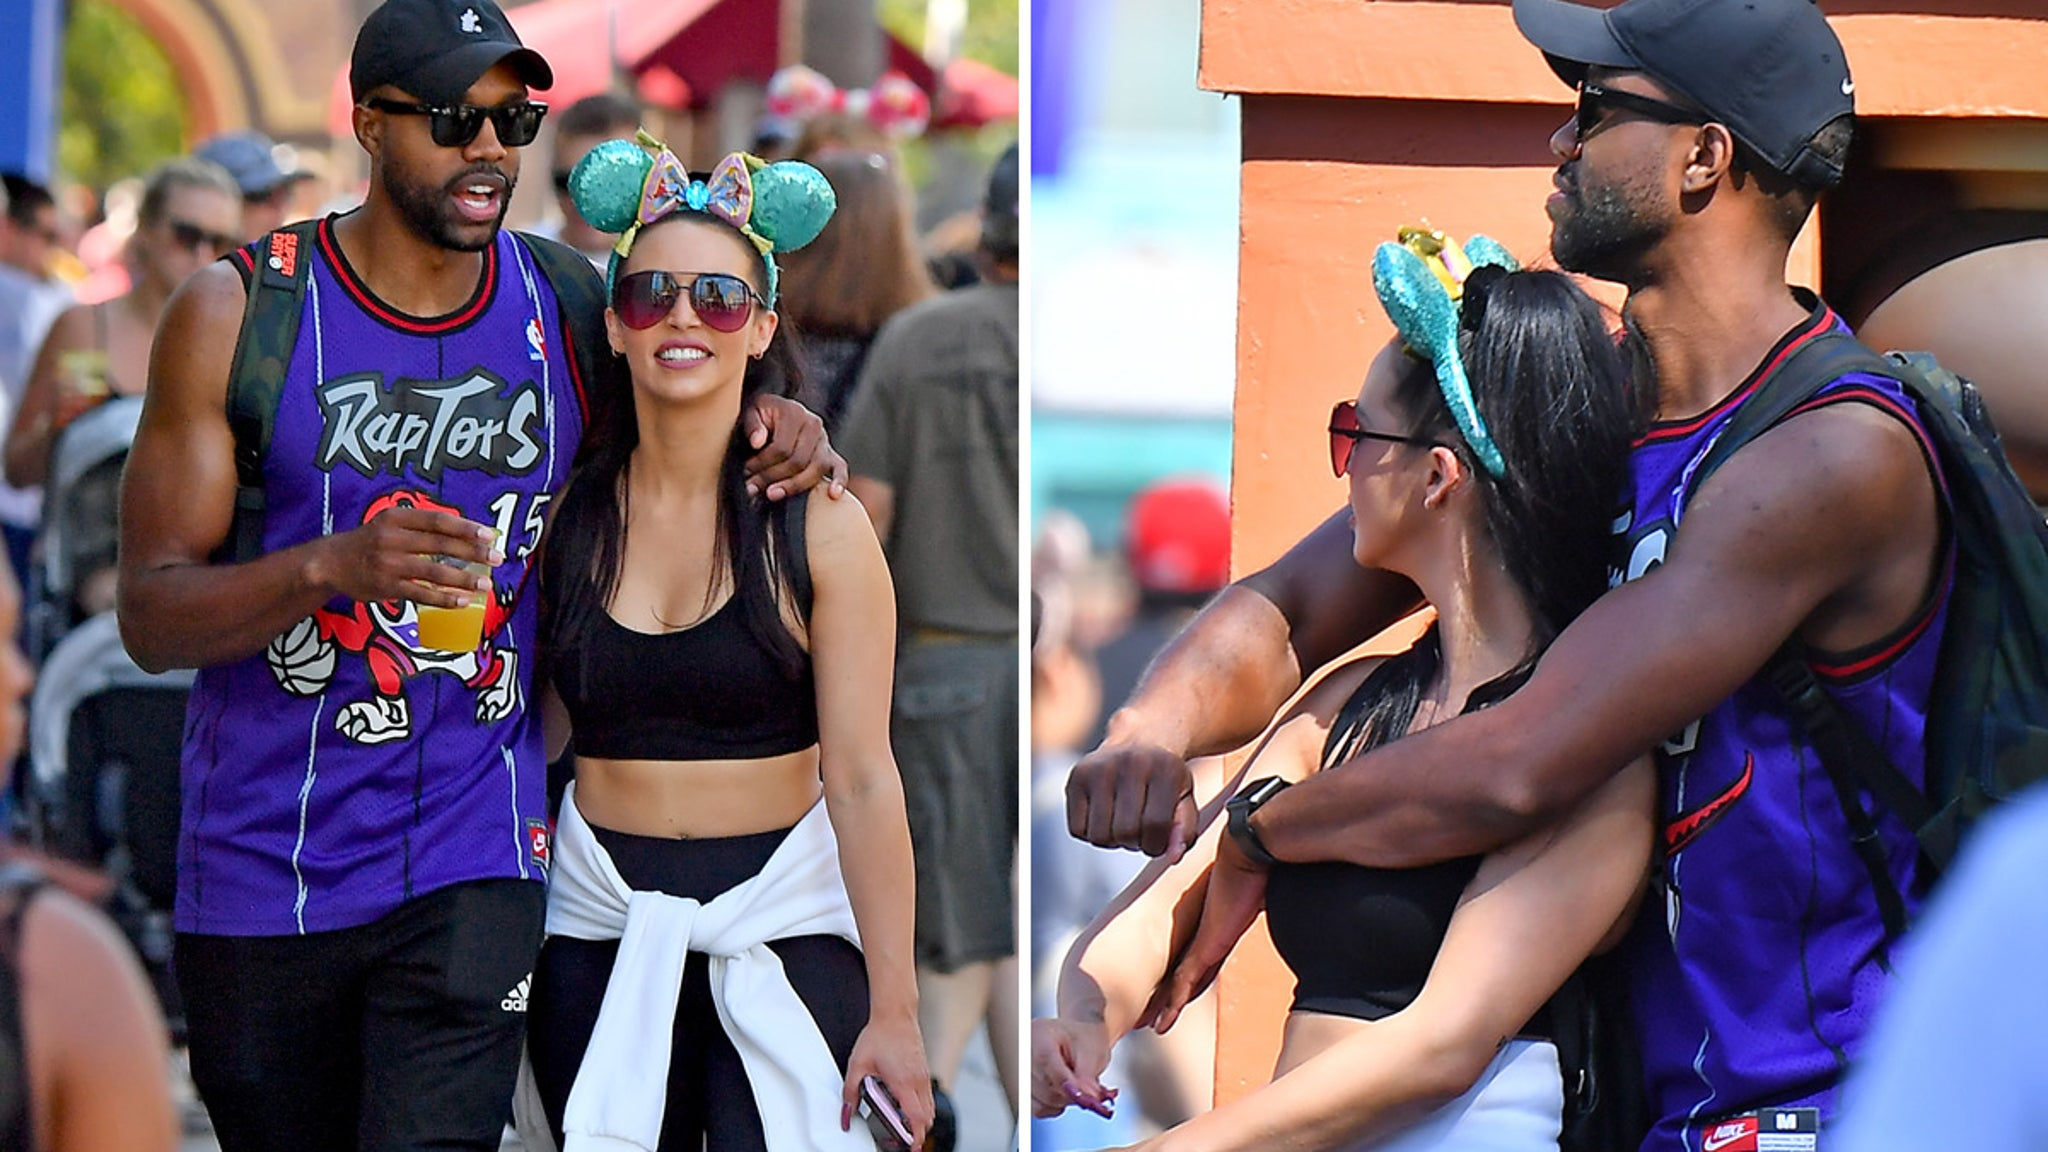 'Vanderpump Rules' Star Scheana Shay on Disney Date with DeMario Jackson